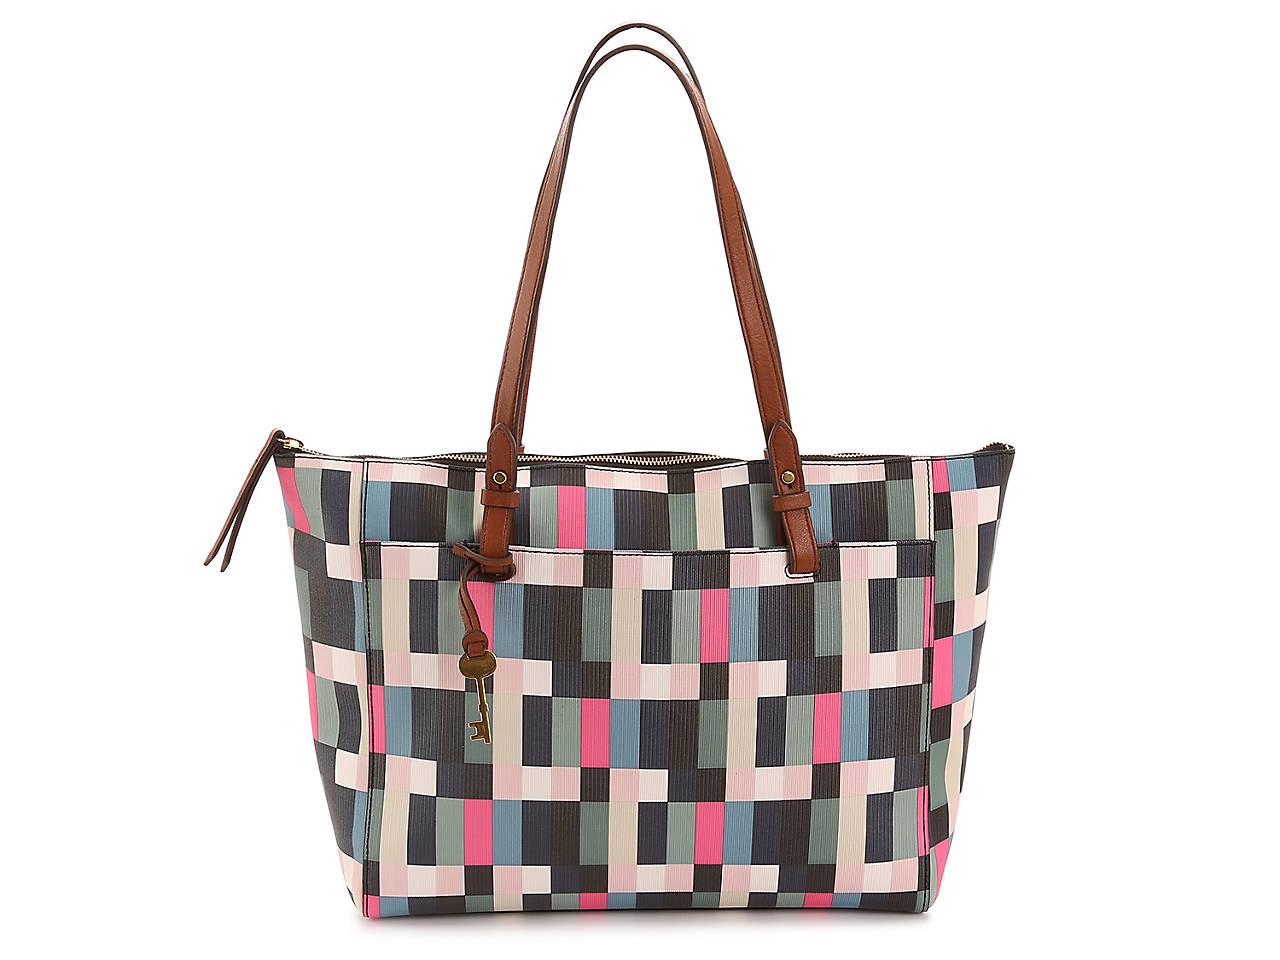 d1a307658 Fossil Rachel Tote Women's Handbags & Accessories | DSW